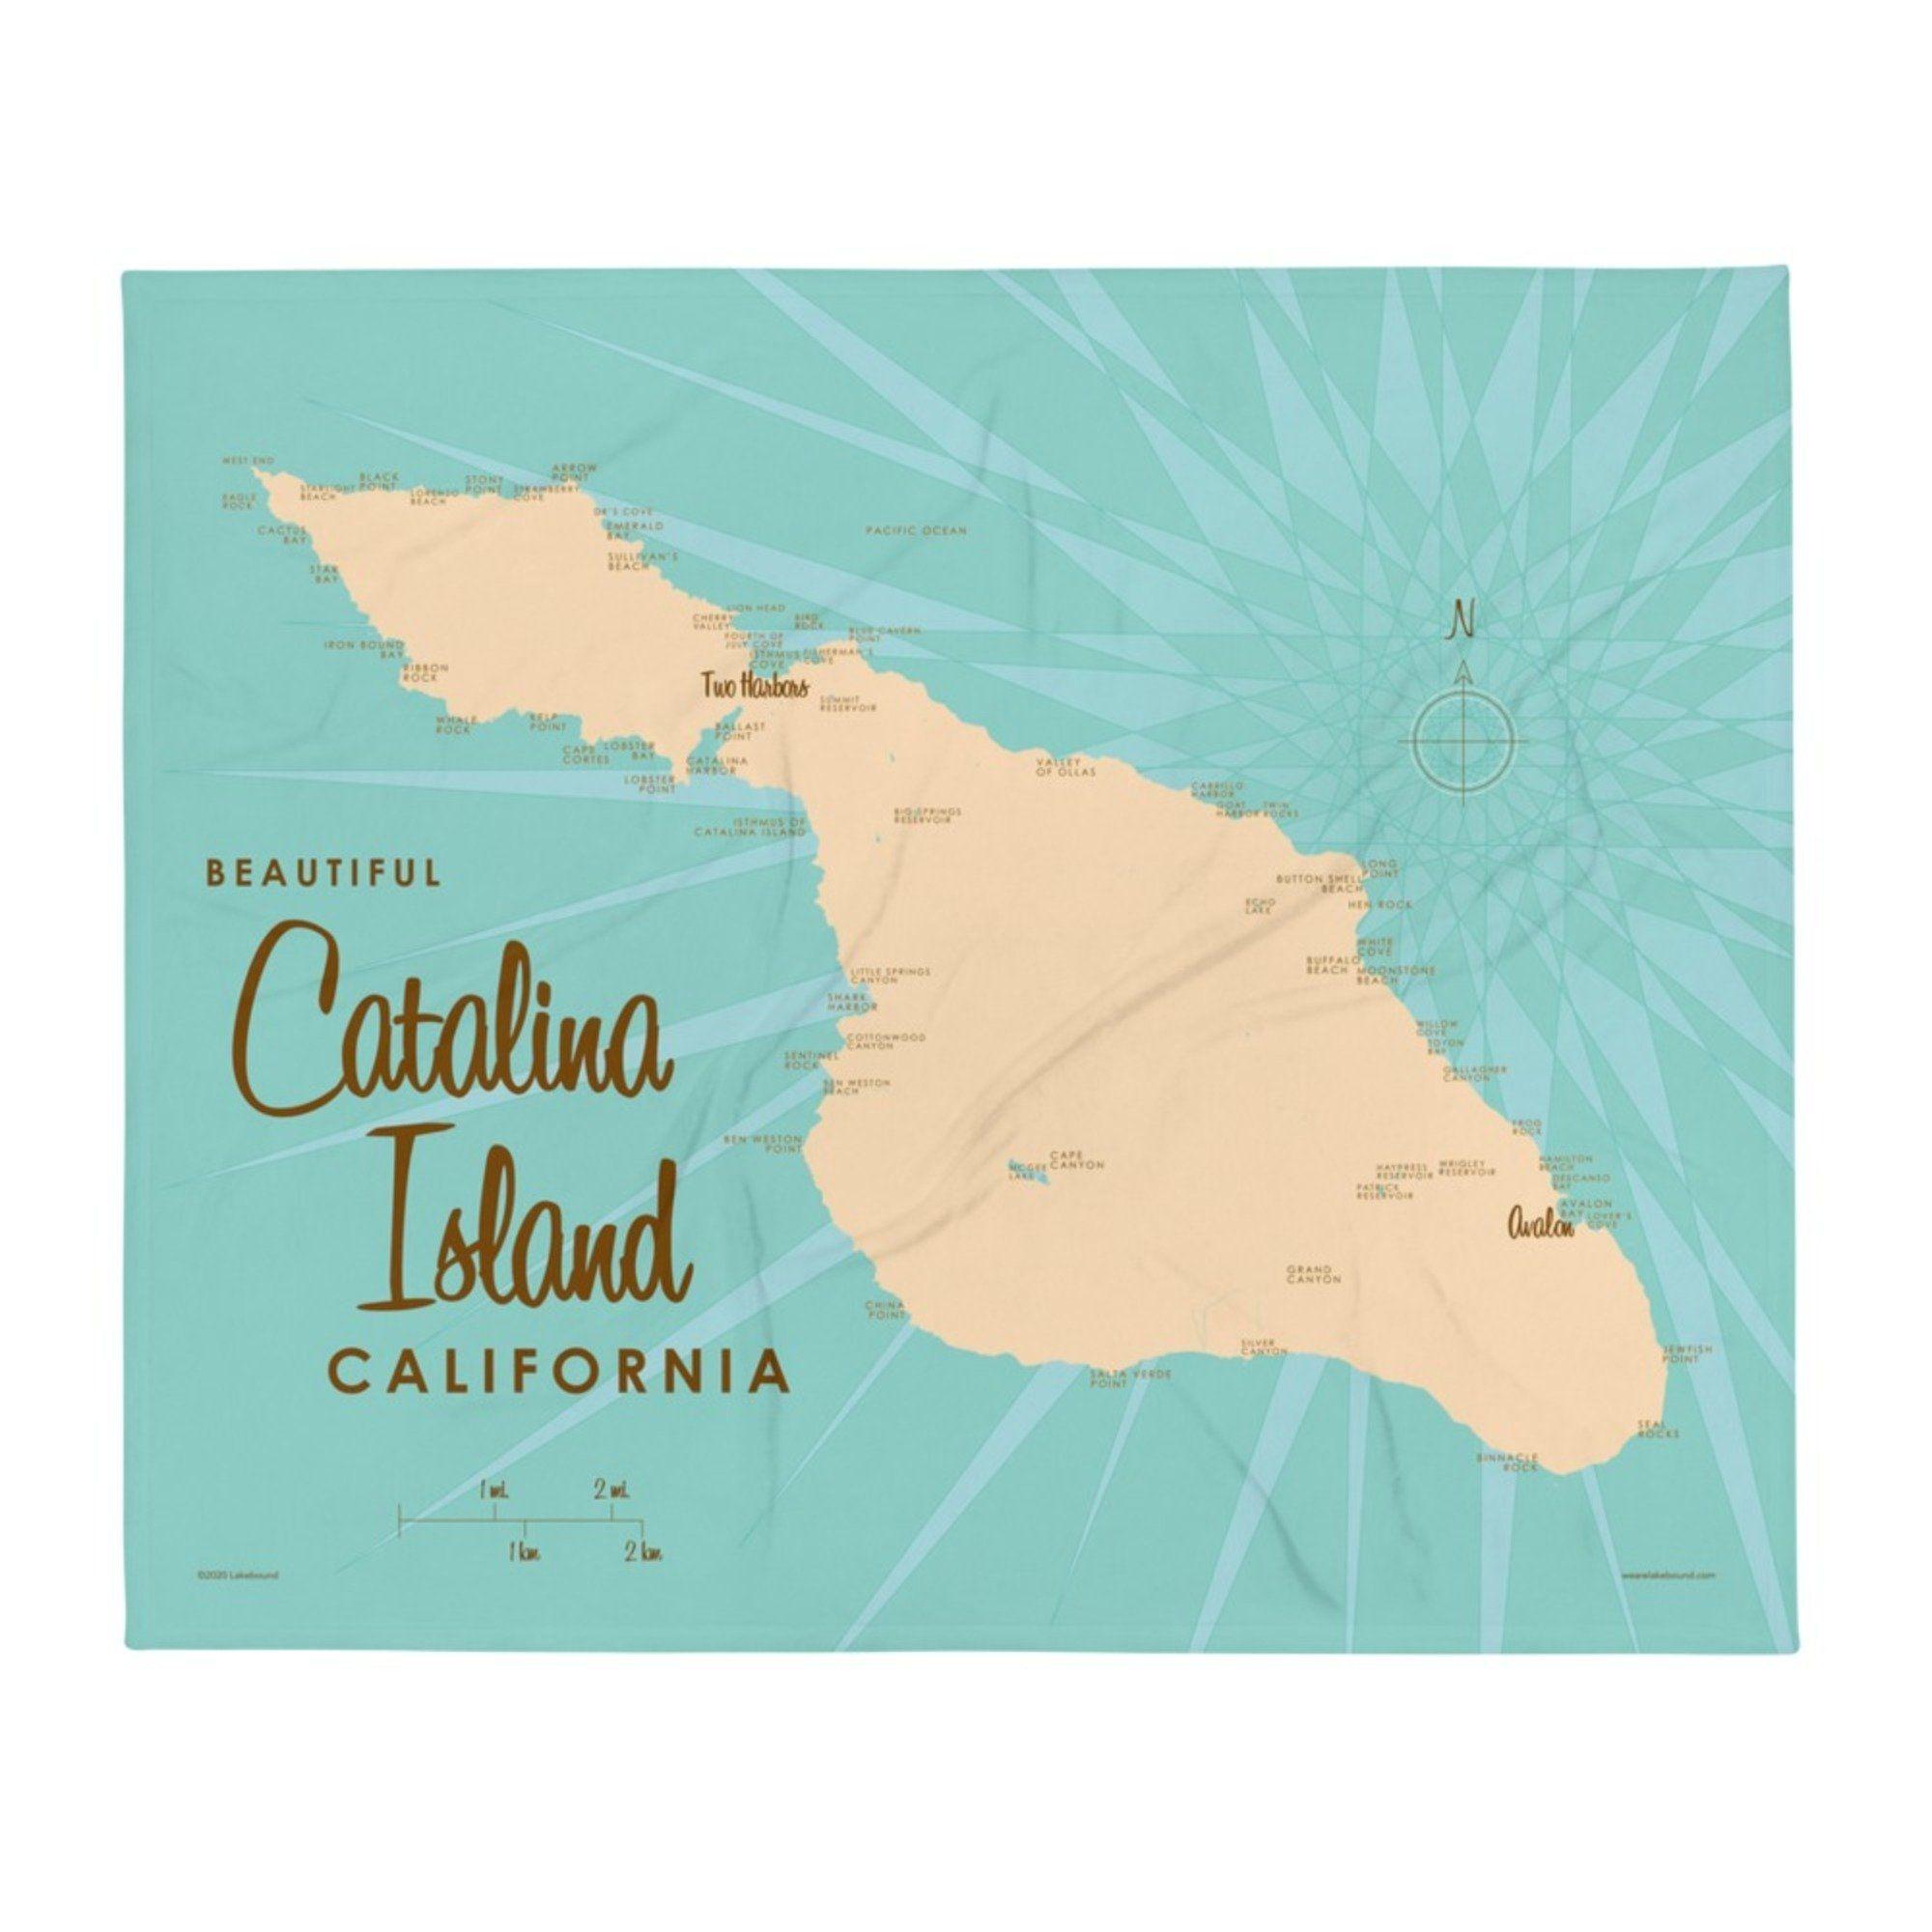 Catalina Island California Throw Blanket - 50x60 inch / White